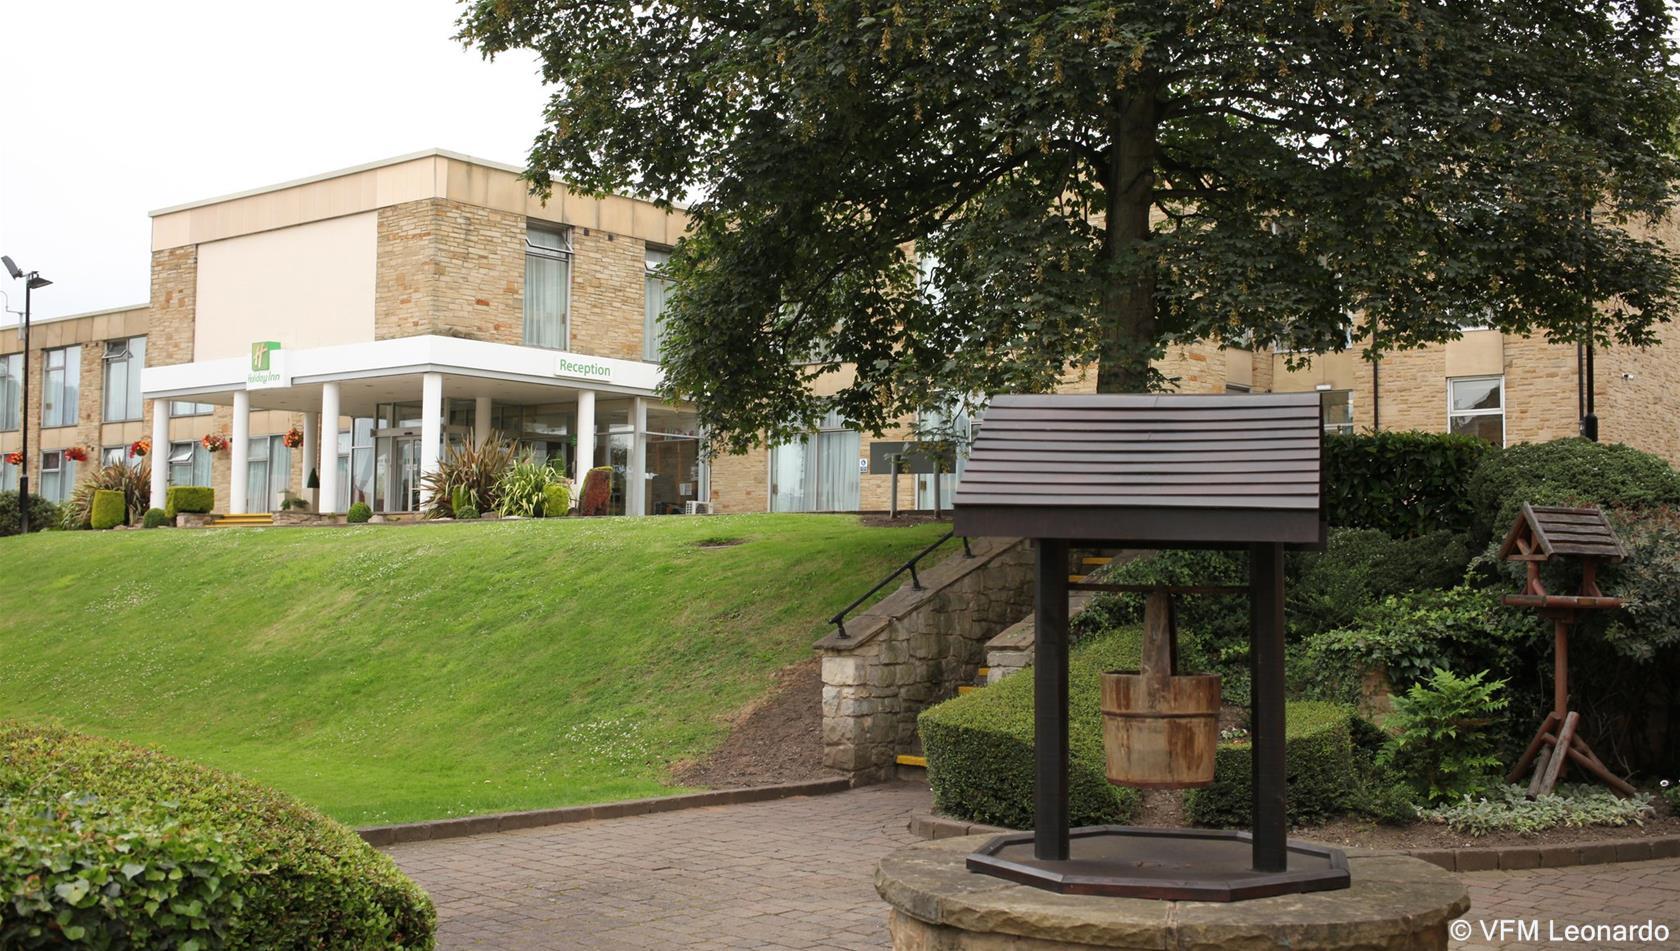 Holiday Inn Doncaster A1/J36, Doncaster